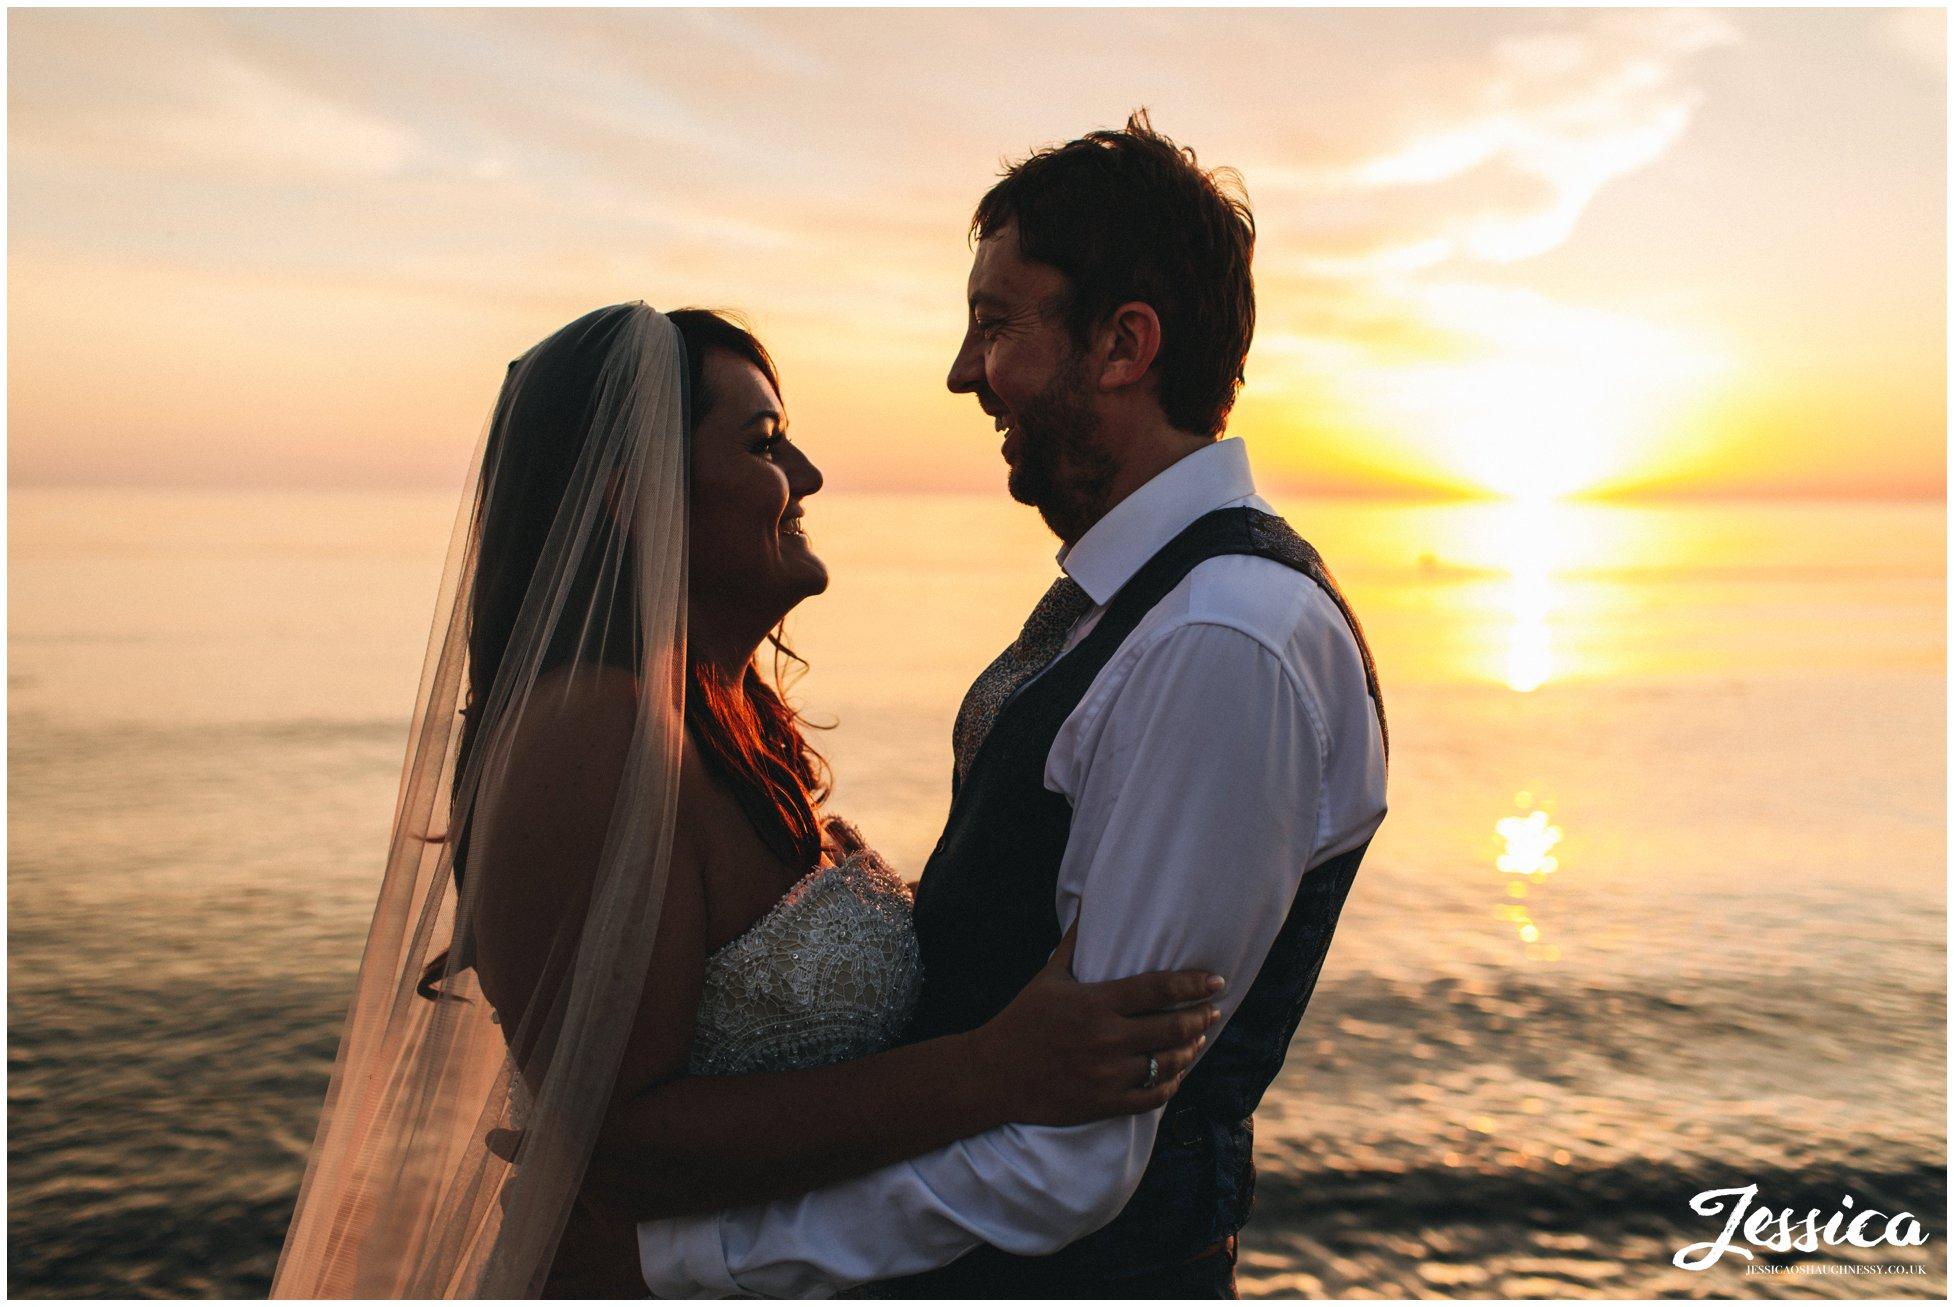 couple smile at each other as the sun sets on Caernarfon bay